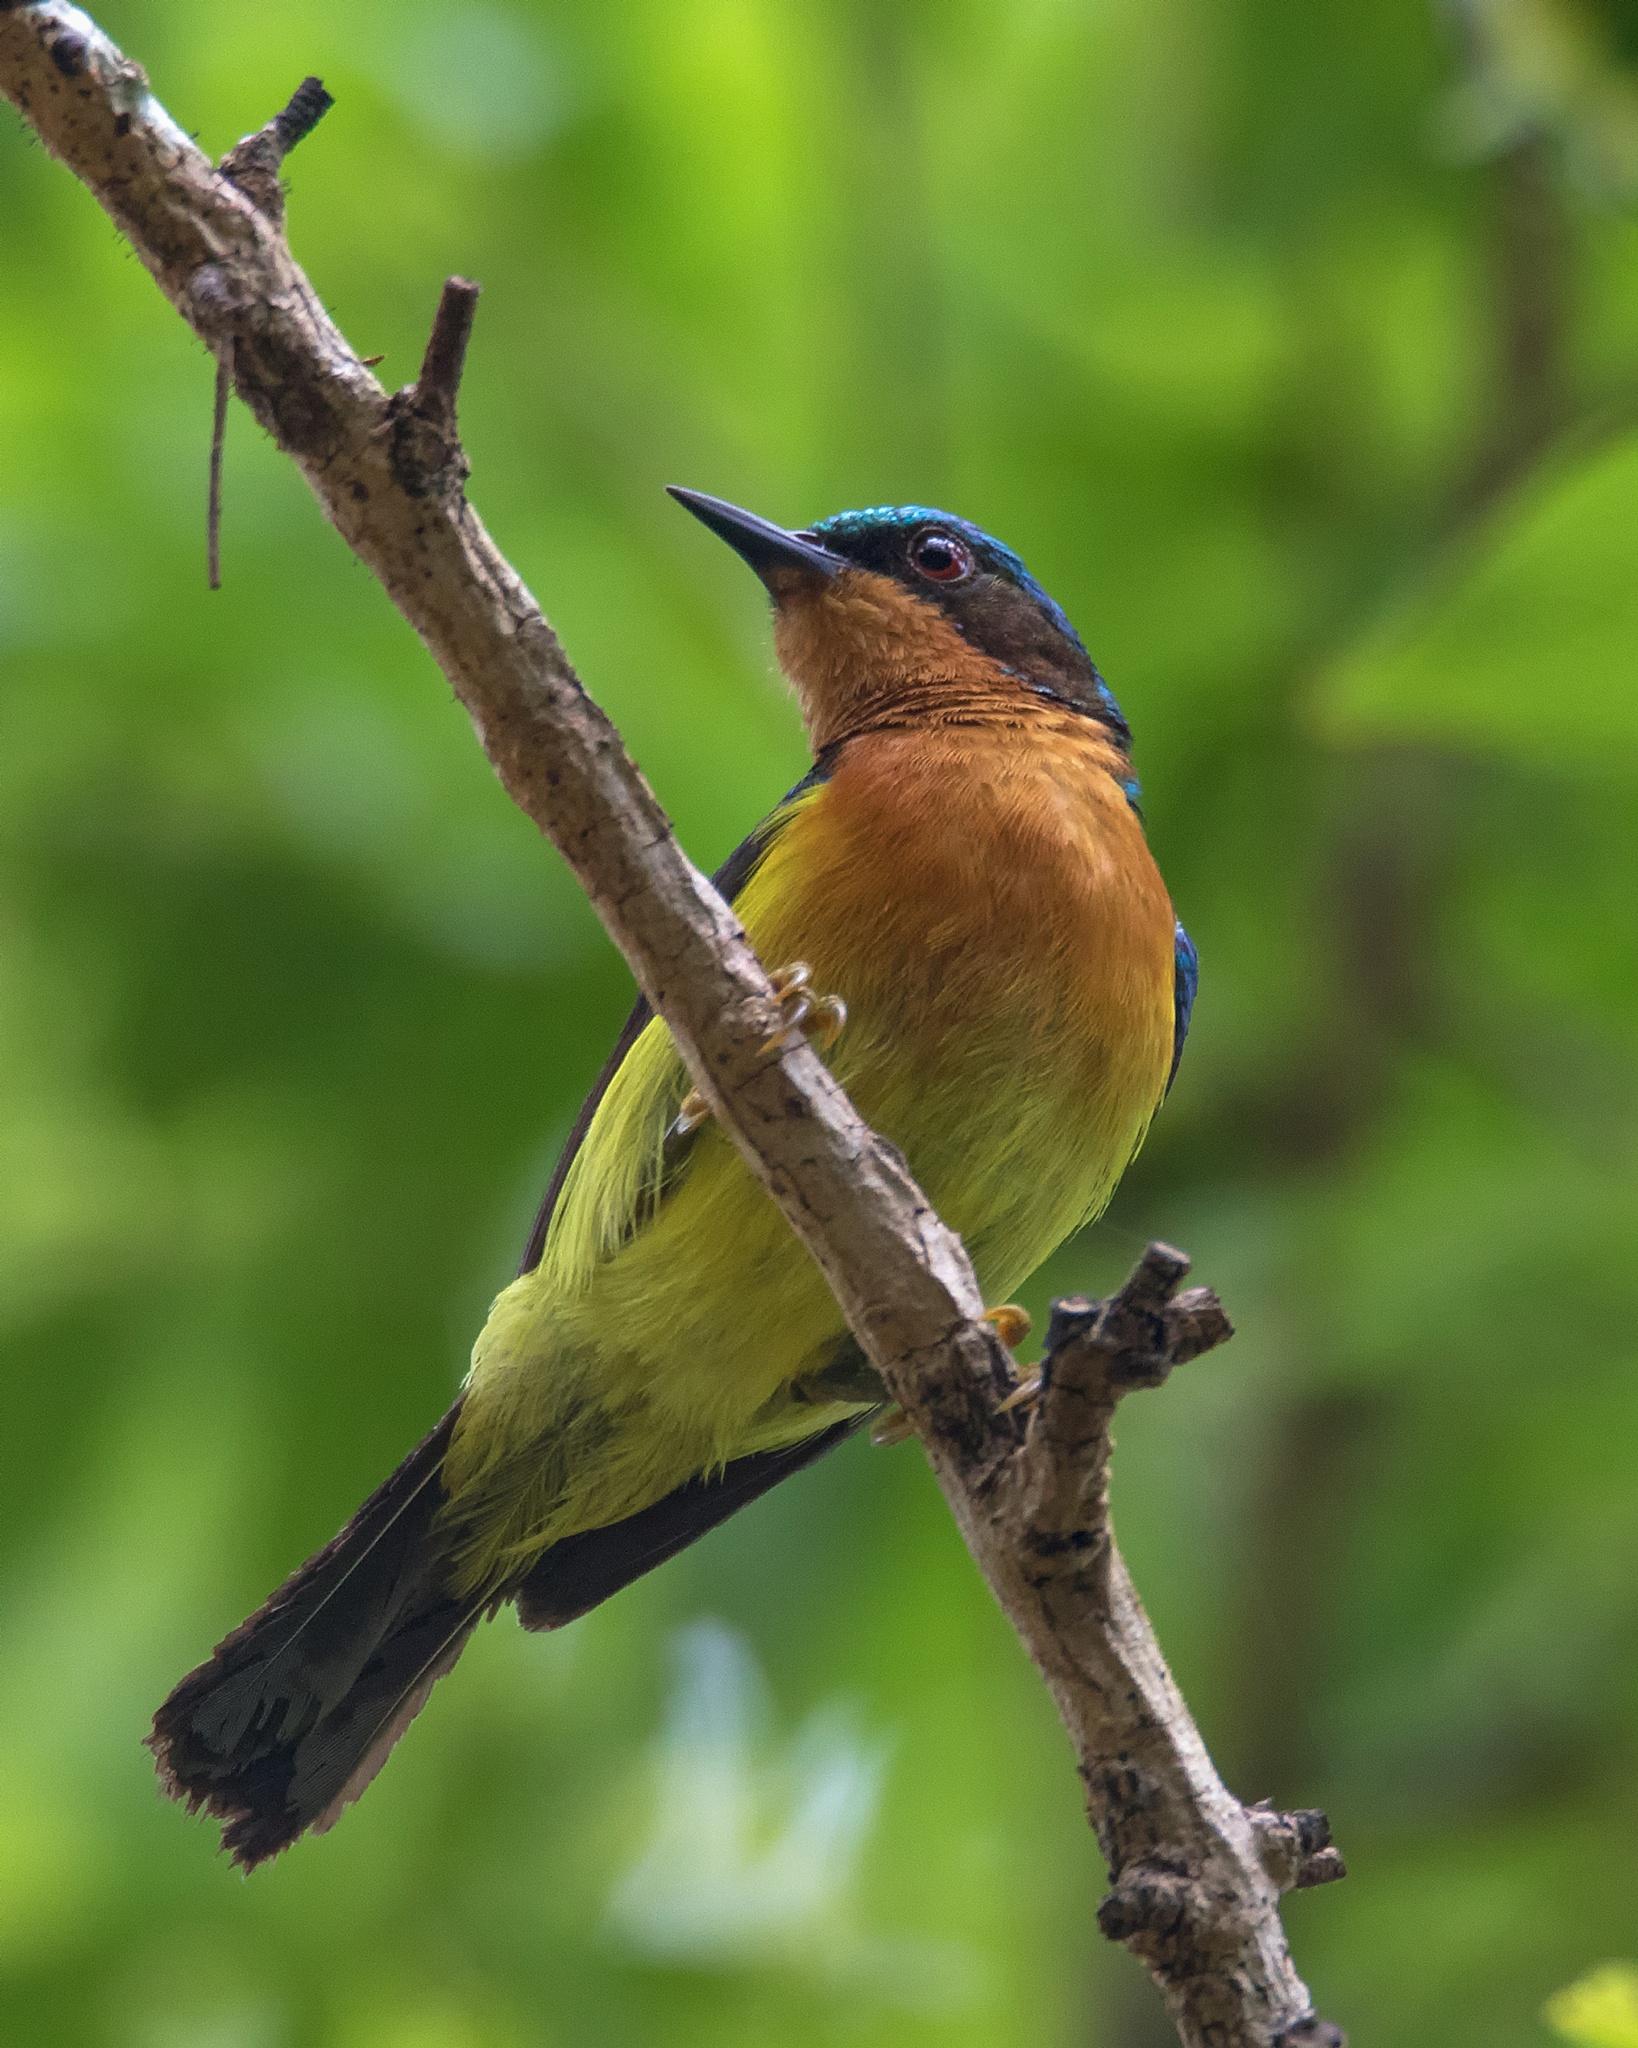 Ruby - Cheeked Sunbird (male) (Sci - Chalcoparia Singalensis) @ Myanmar (Burma) by lone.aww